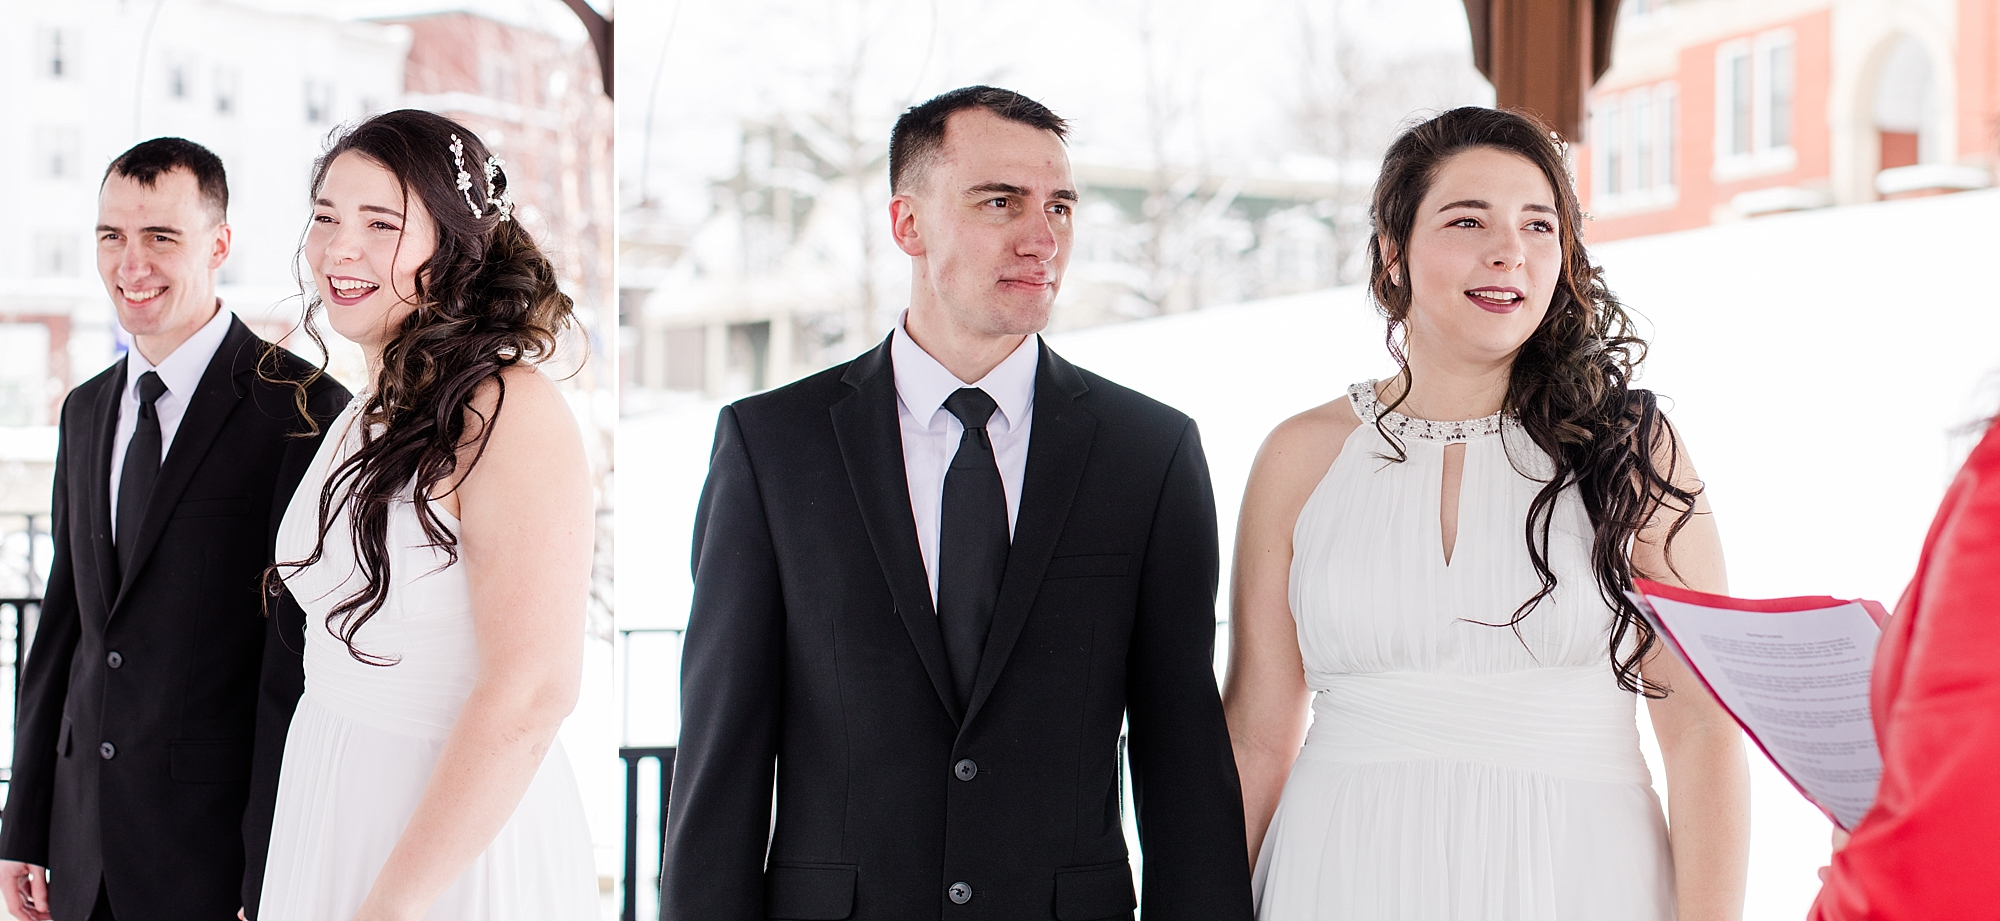 eisleyimages-downtown-marlboro-wedding-newengland_0014.jpg